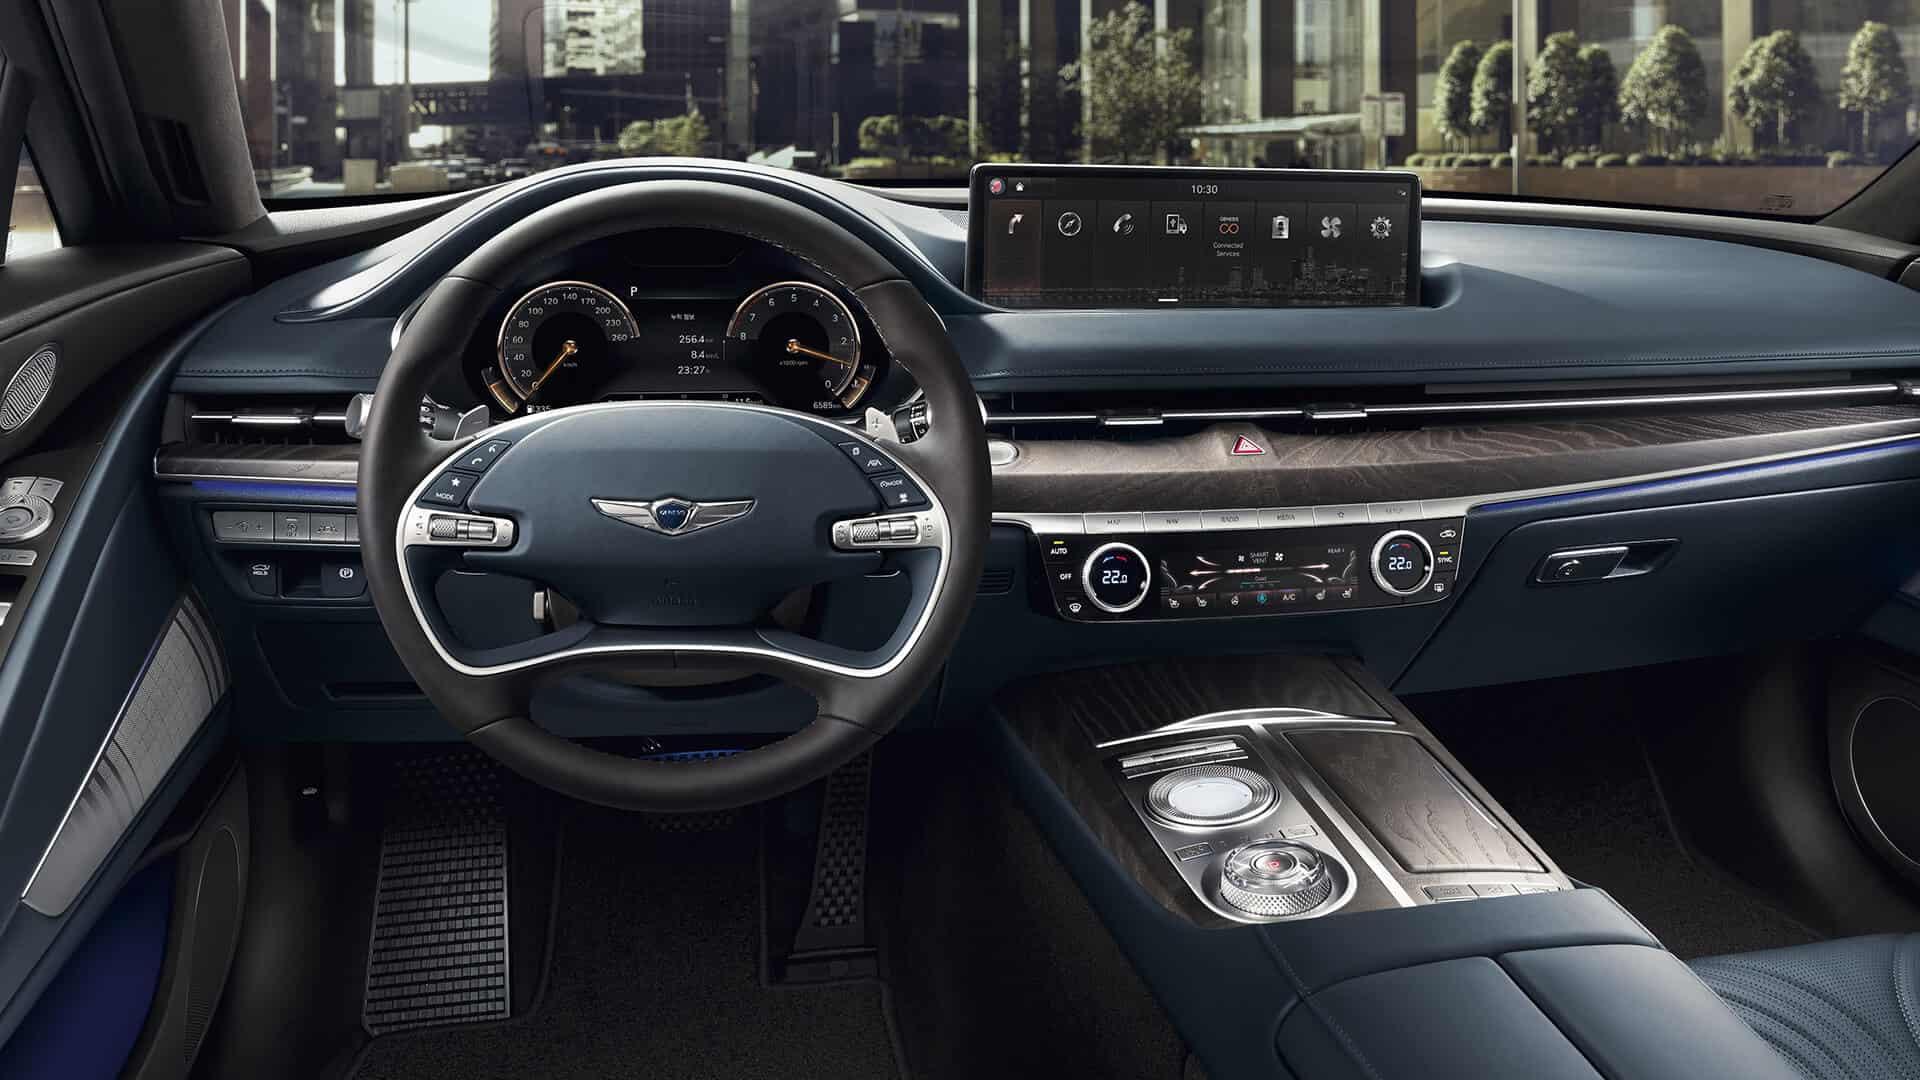 2021 Genesis G80 interior